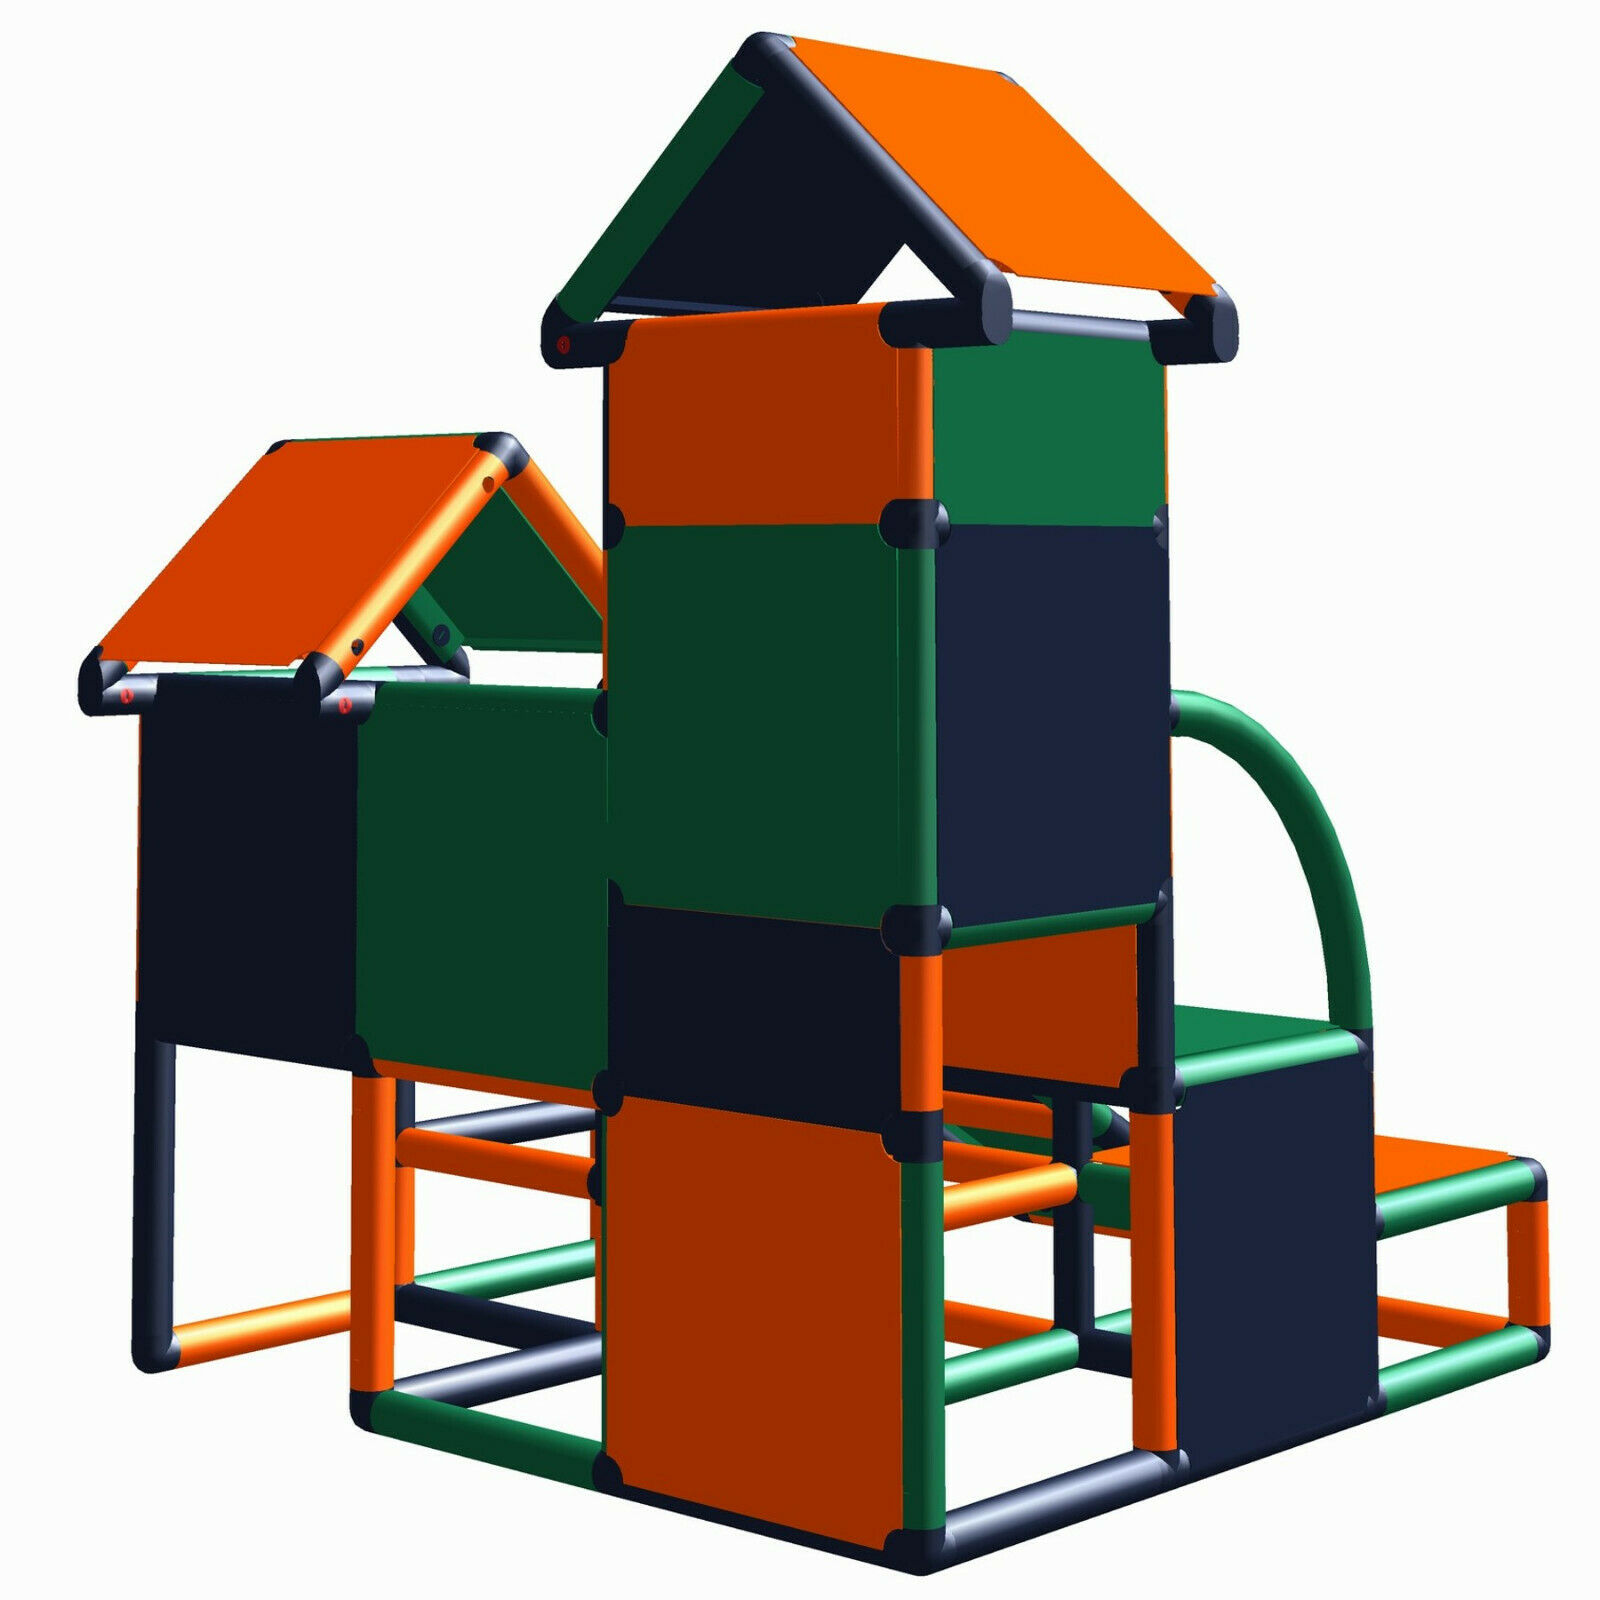 Move and stic Luise Kletterturm Orange-titangrau-grün Spielturm Baukasten